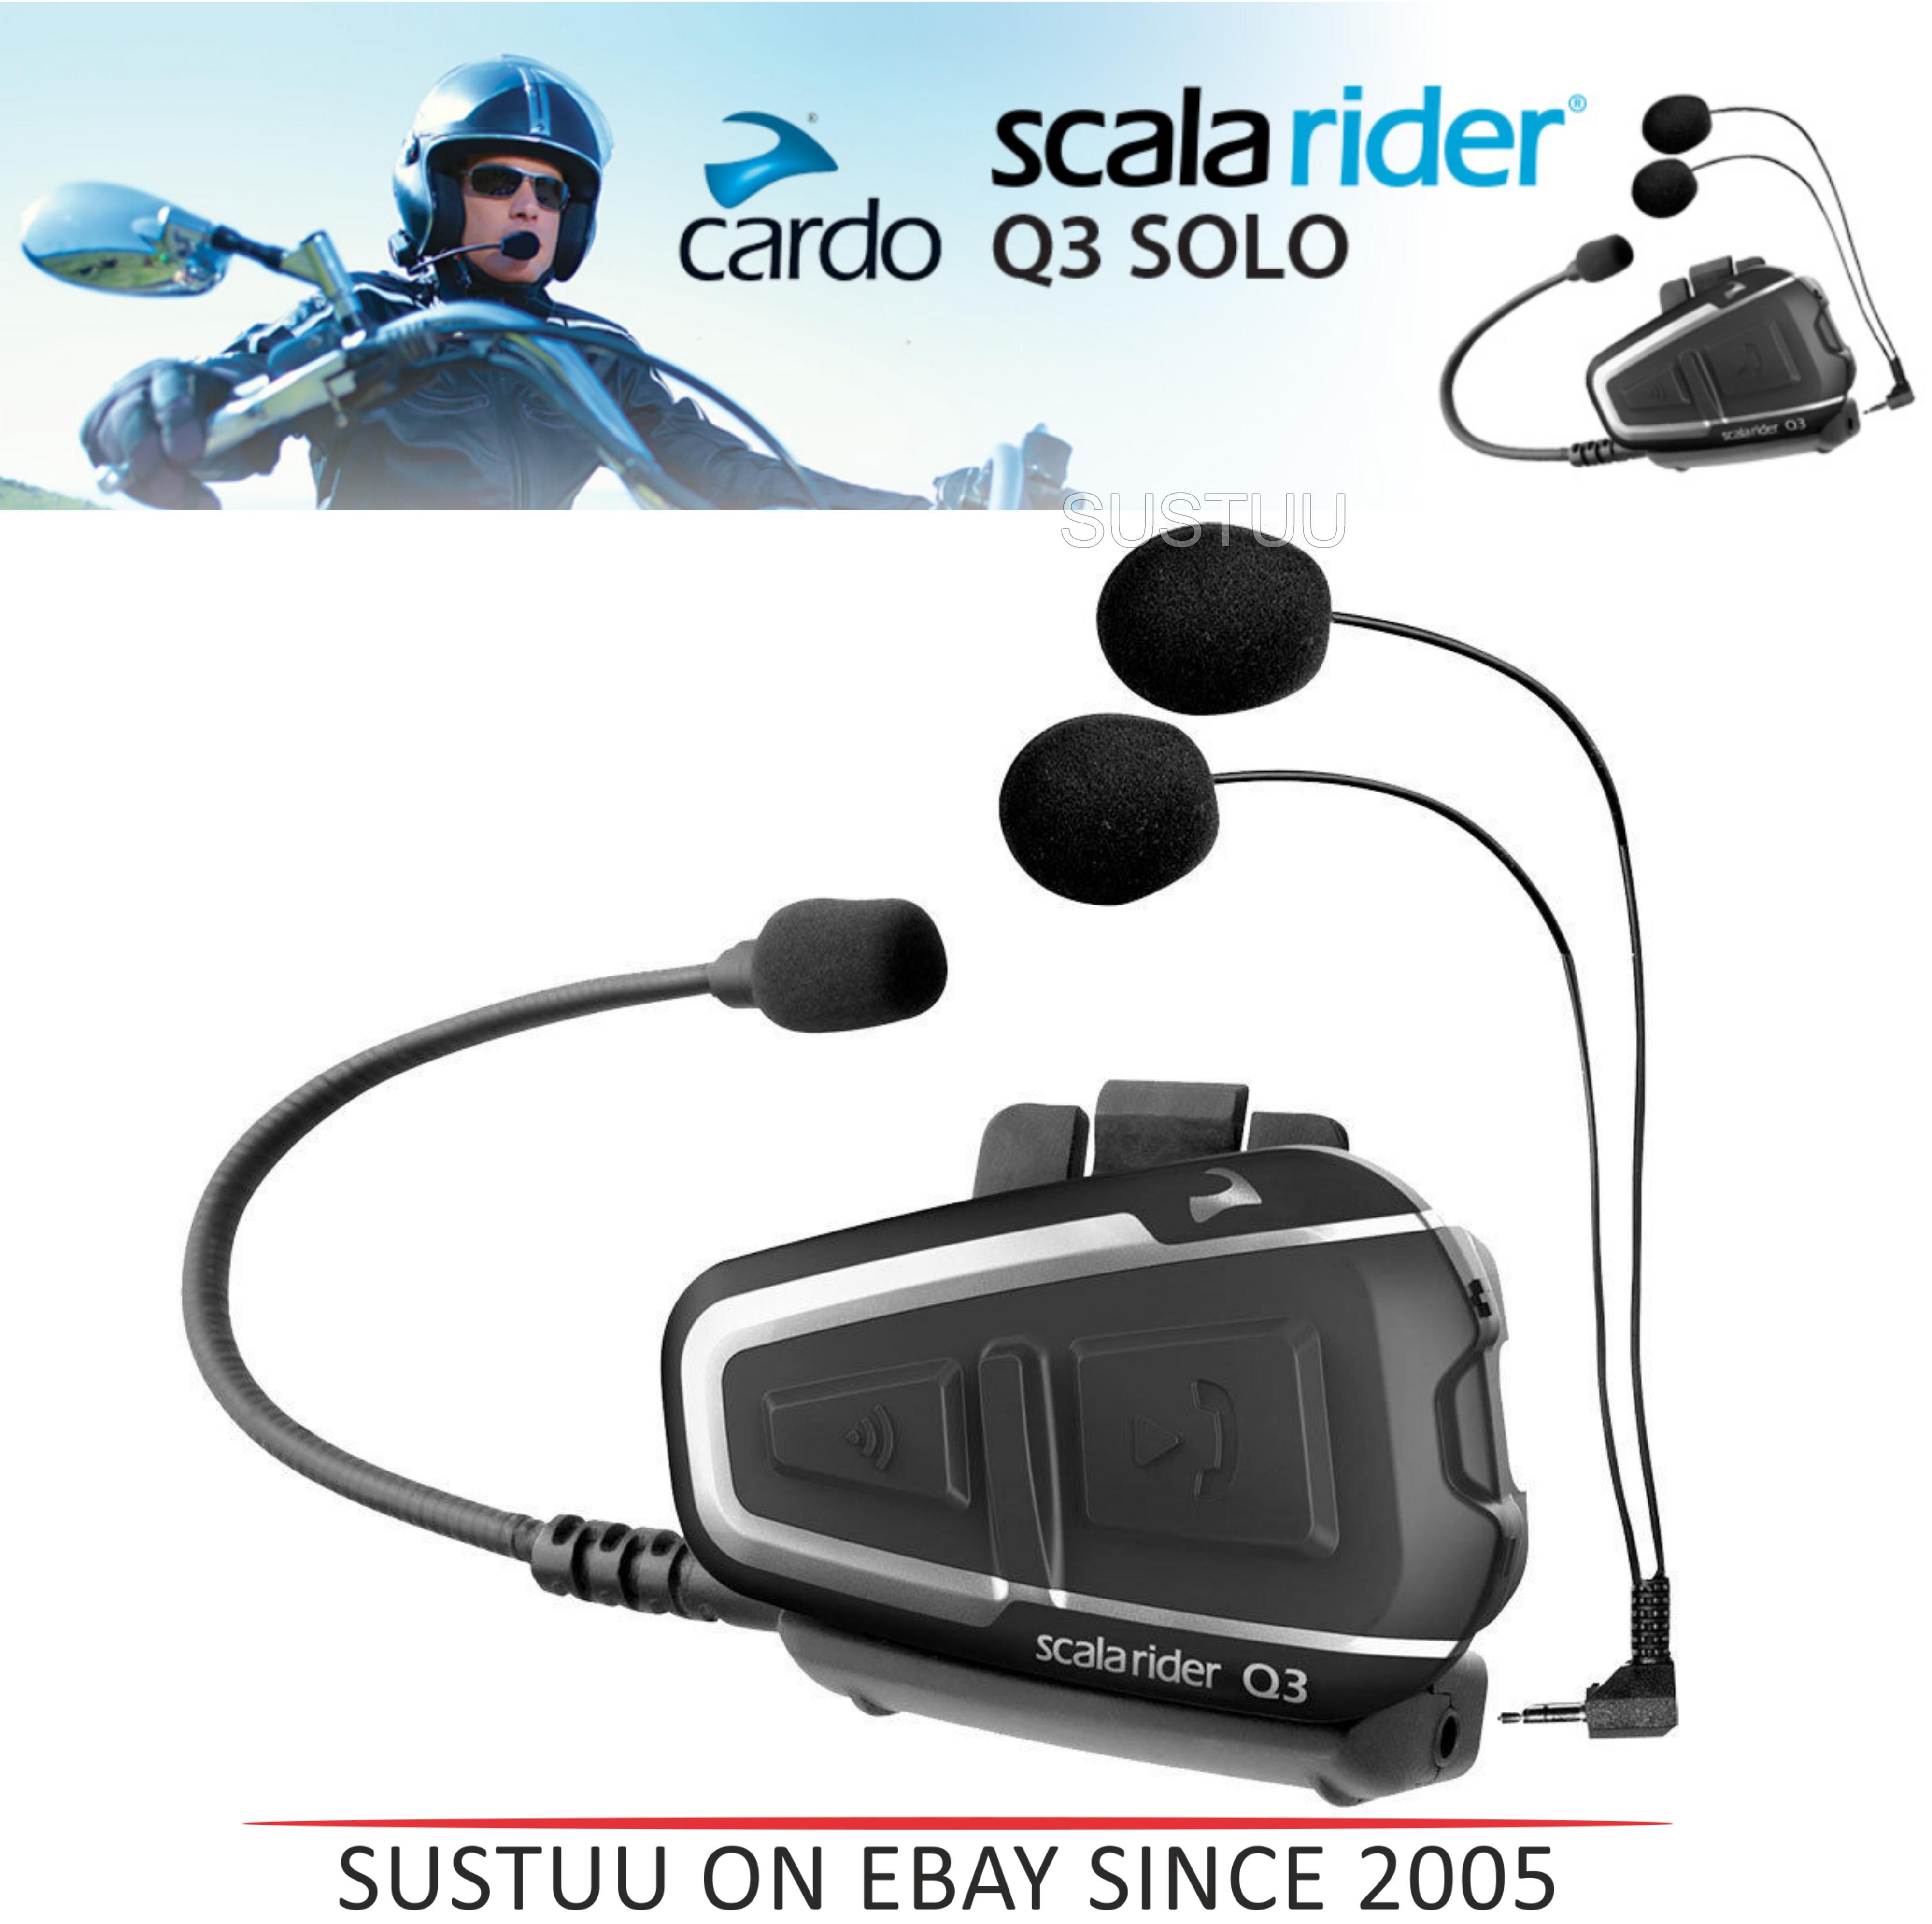 Cardo Scala Rider Q3 Solo Bluetooth Headset |  Motorcycle / Bike Helmet Intercom |  Black